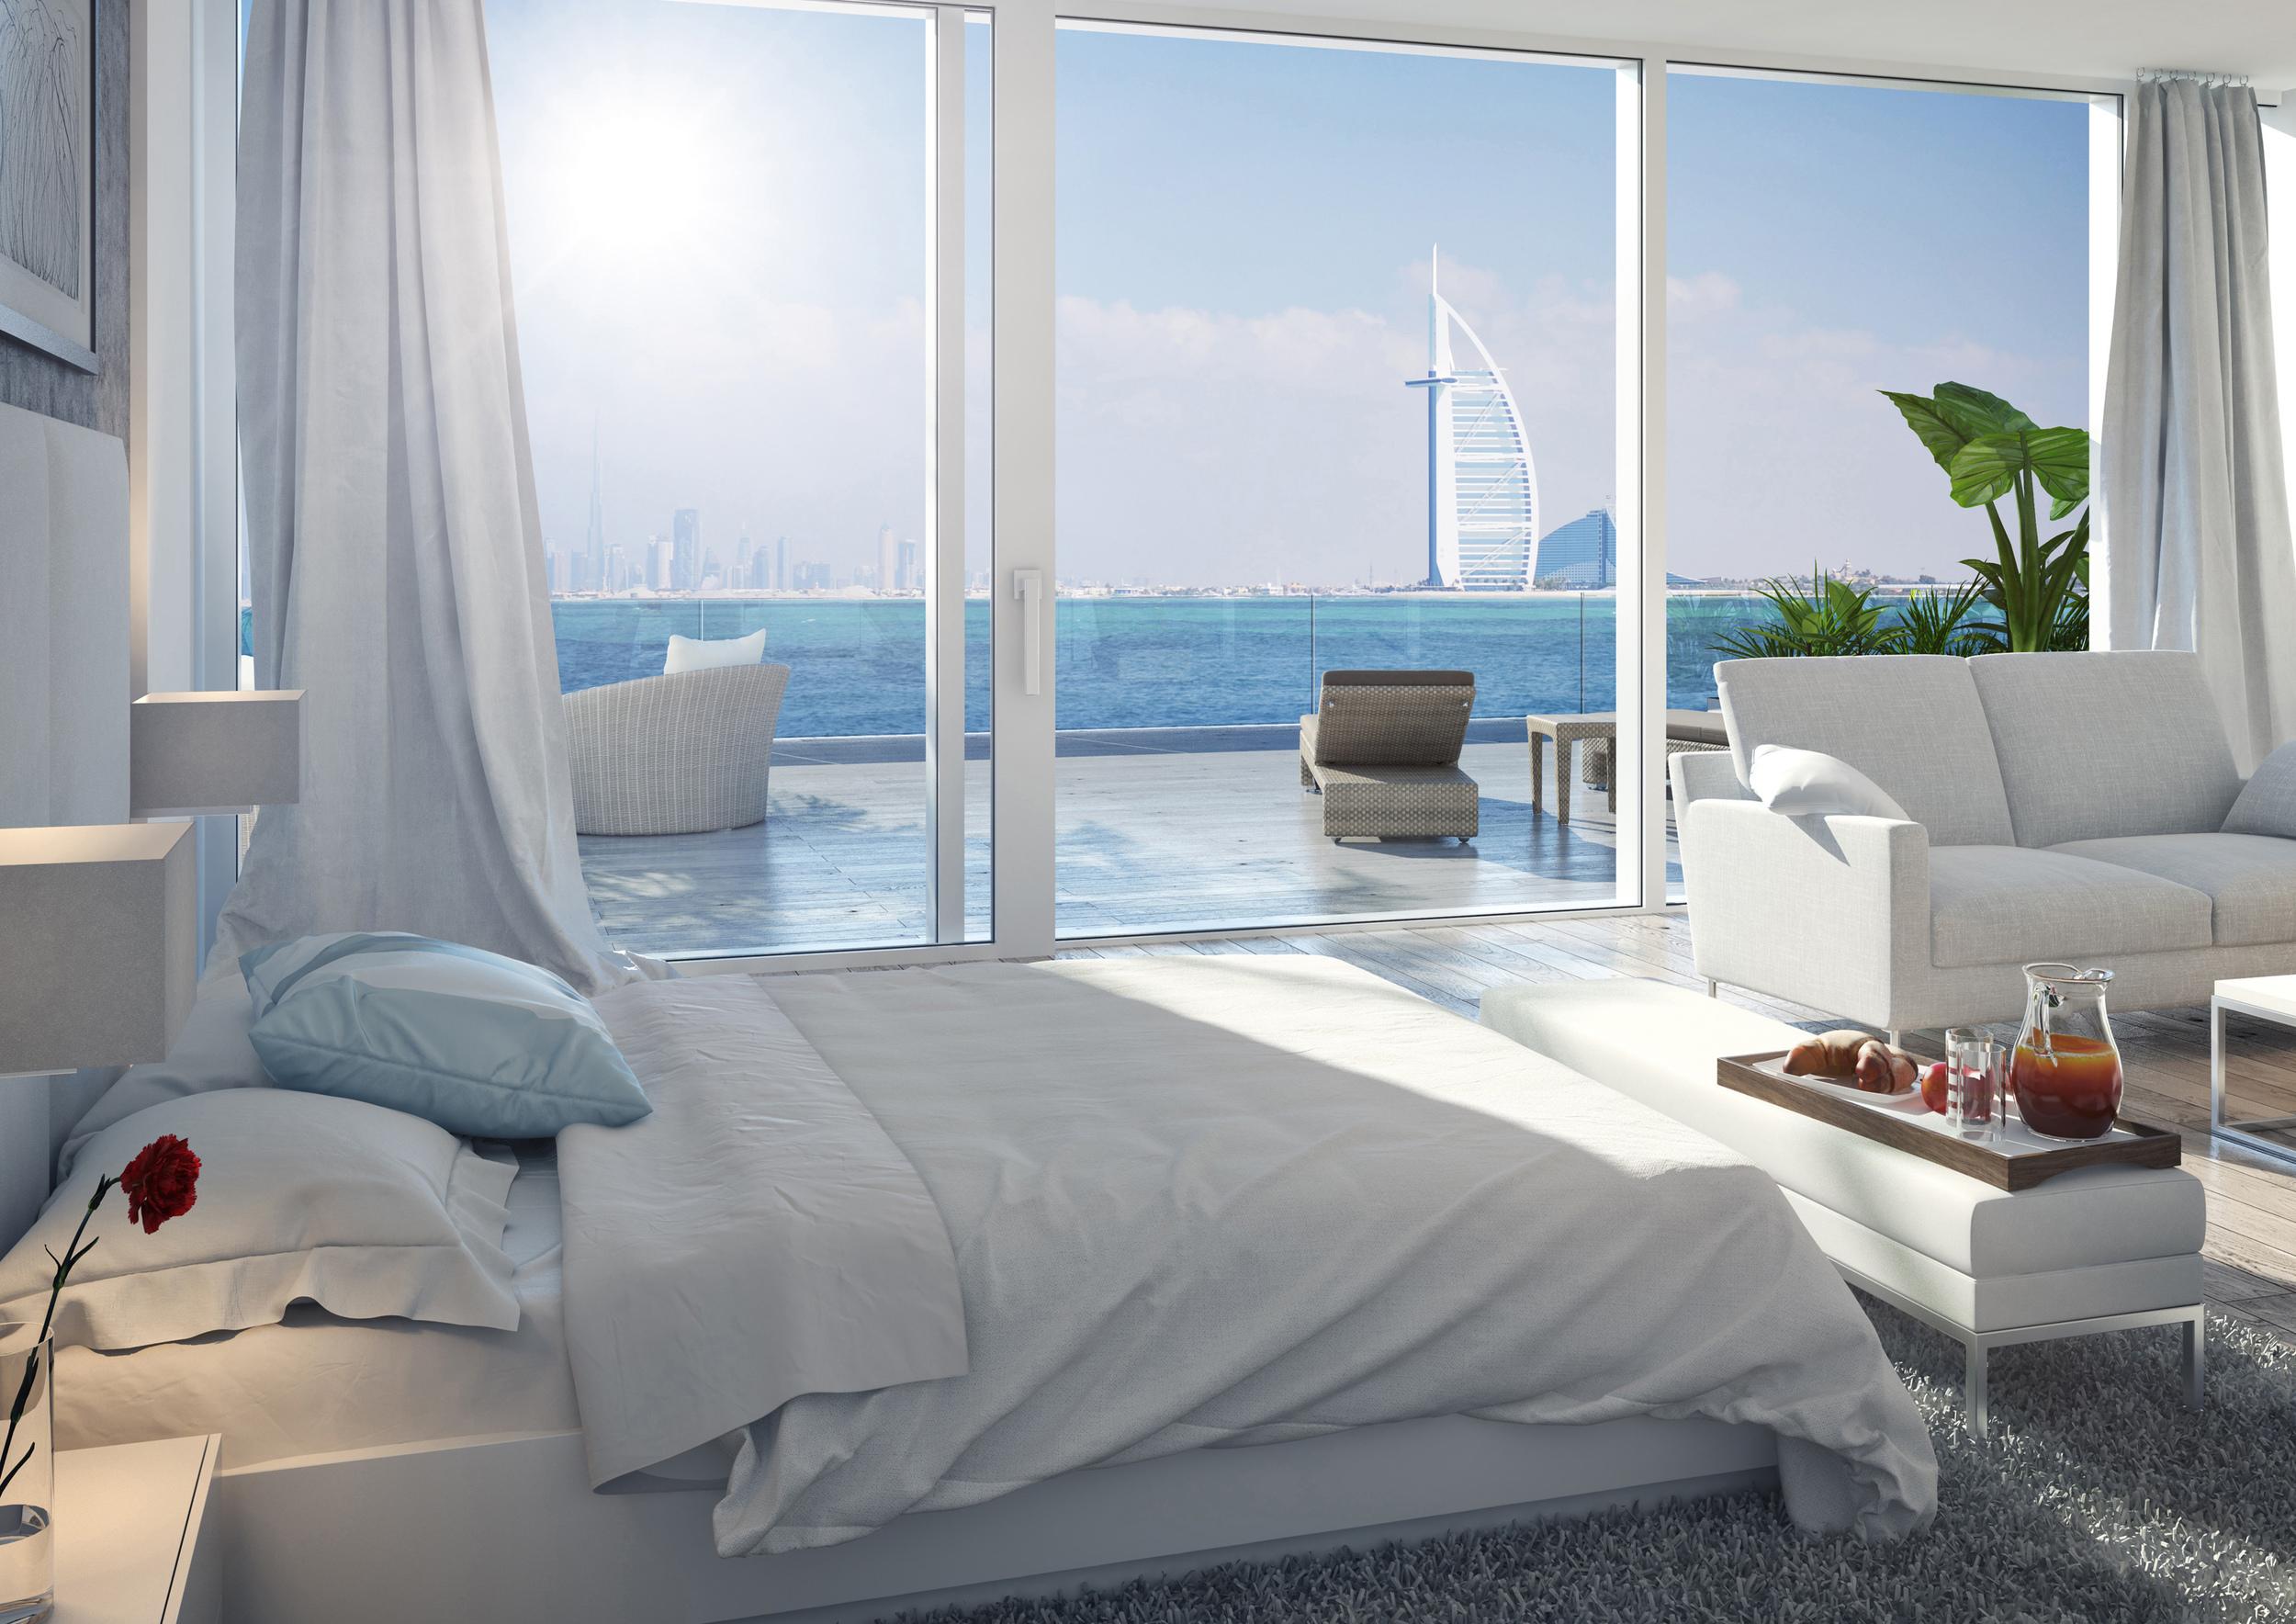 MACINA_Serenia_bed_room.jpg